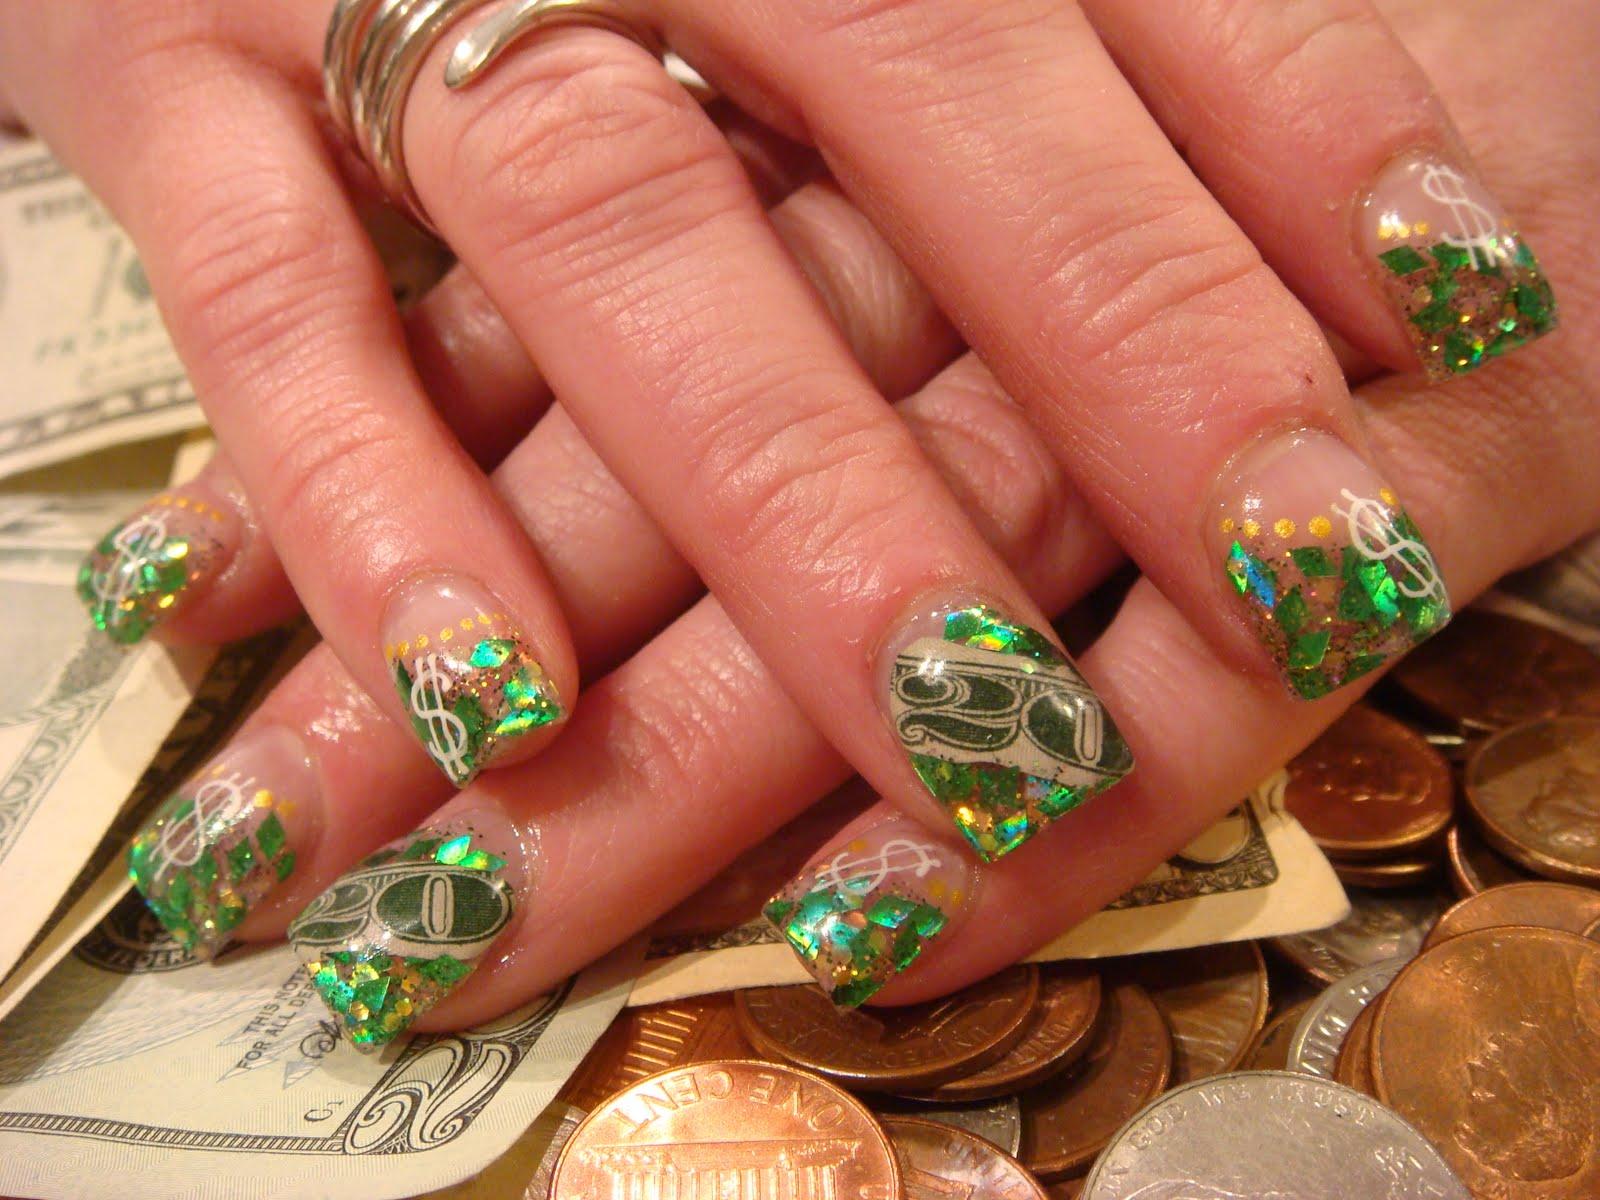 Nail Art: MONEY MONEY MONEY